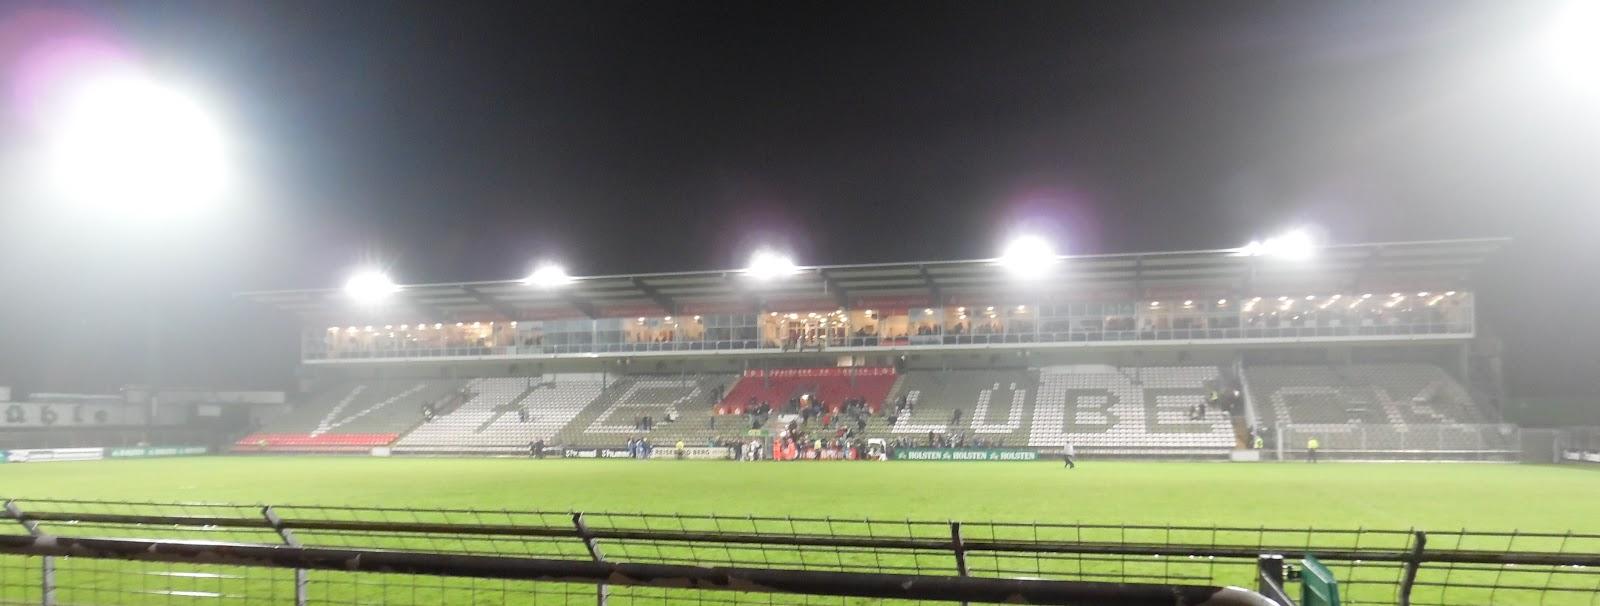 Damage In The Box Vfb Lubeck Stadion An Der Lohmuhle